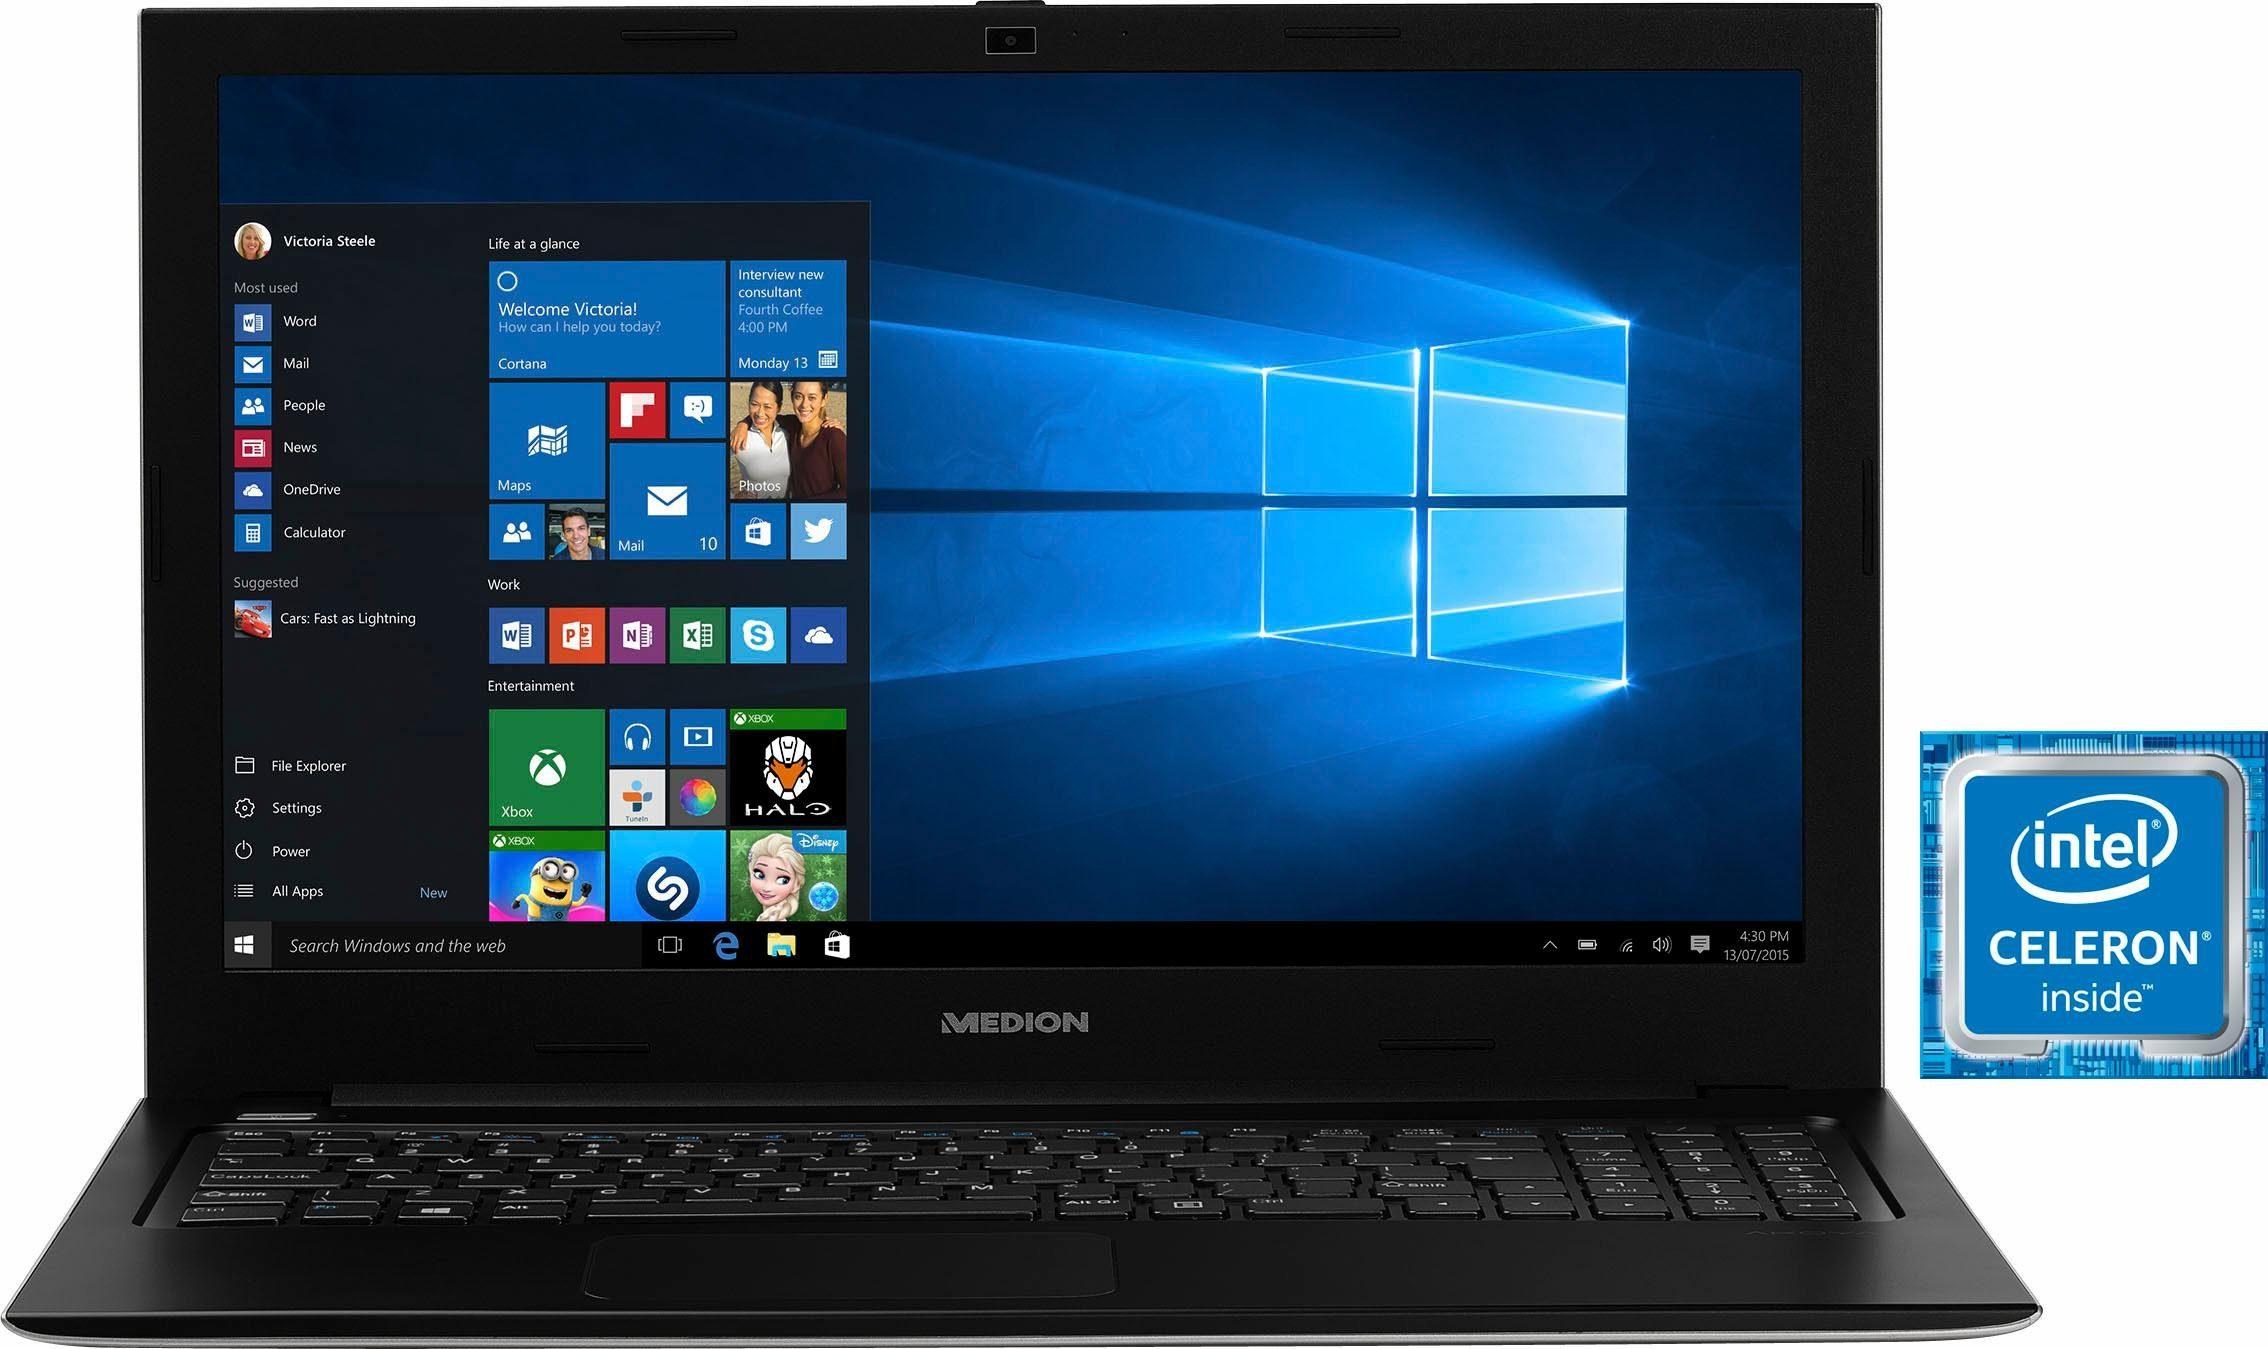 Medion® MD60258 S6219 DE Notebook, Intel® Celeron™, 39,6 cm (15,6 Zoll), 532 GB Speicher